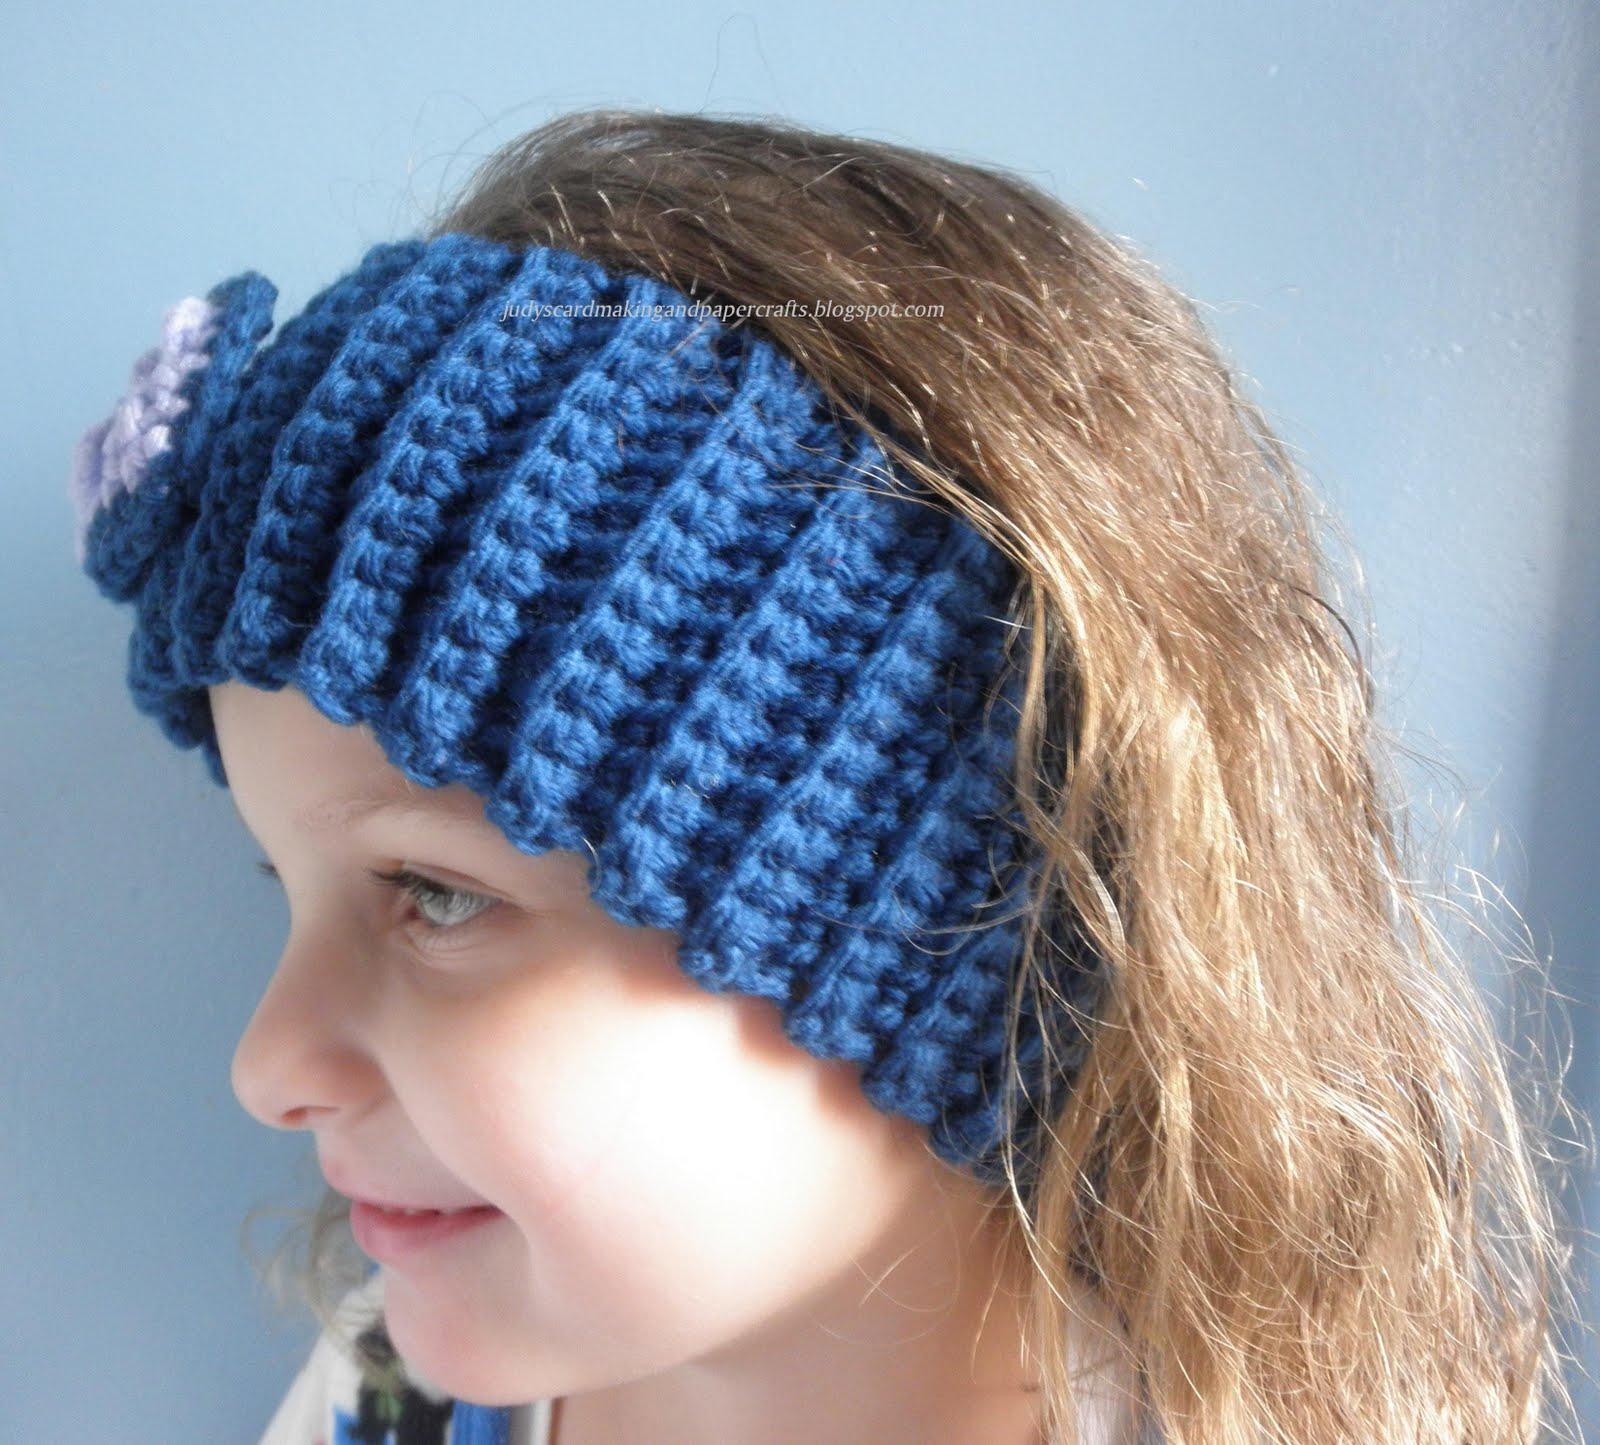 Crochet Headbands : Judys Handmade Creations: Crocheted headband!